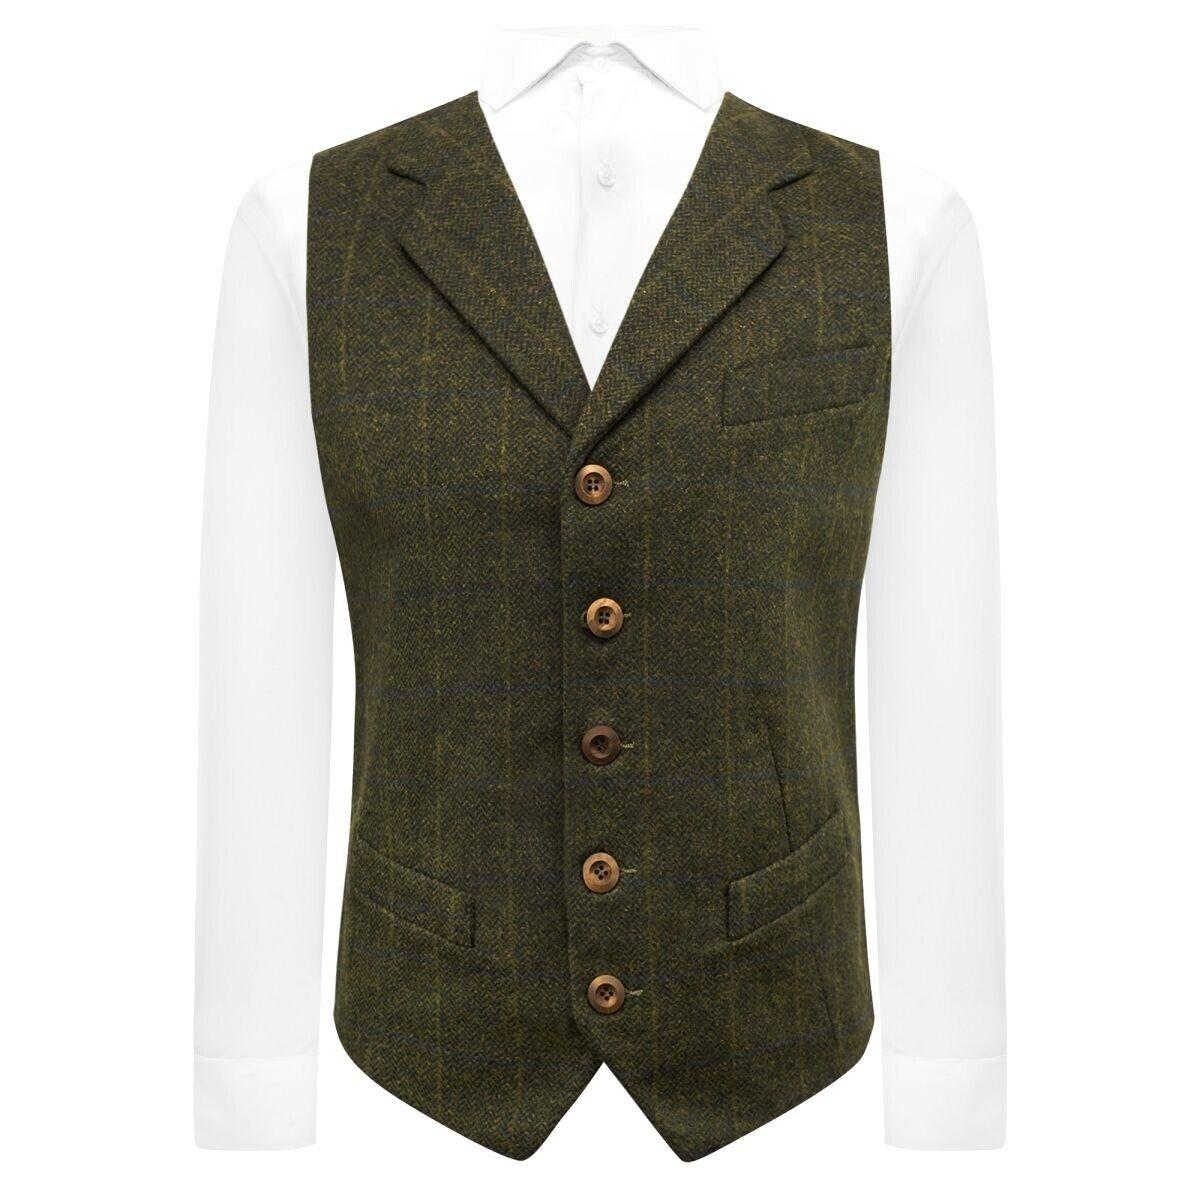 Luxury Juniper Green Herringbone Check Waistcoat with Lapel, Tweed